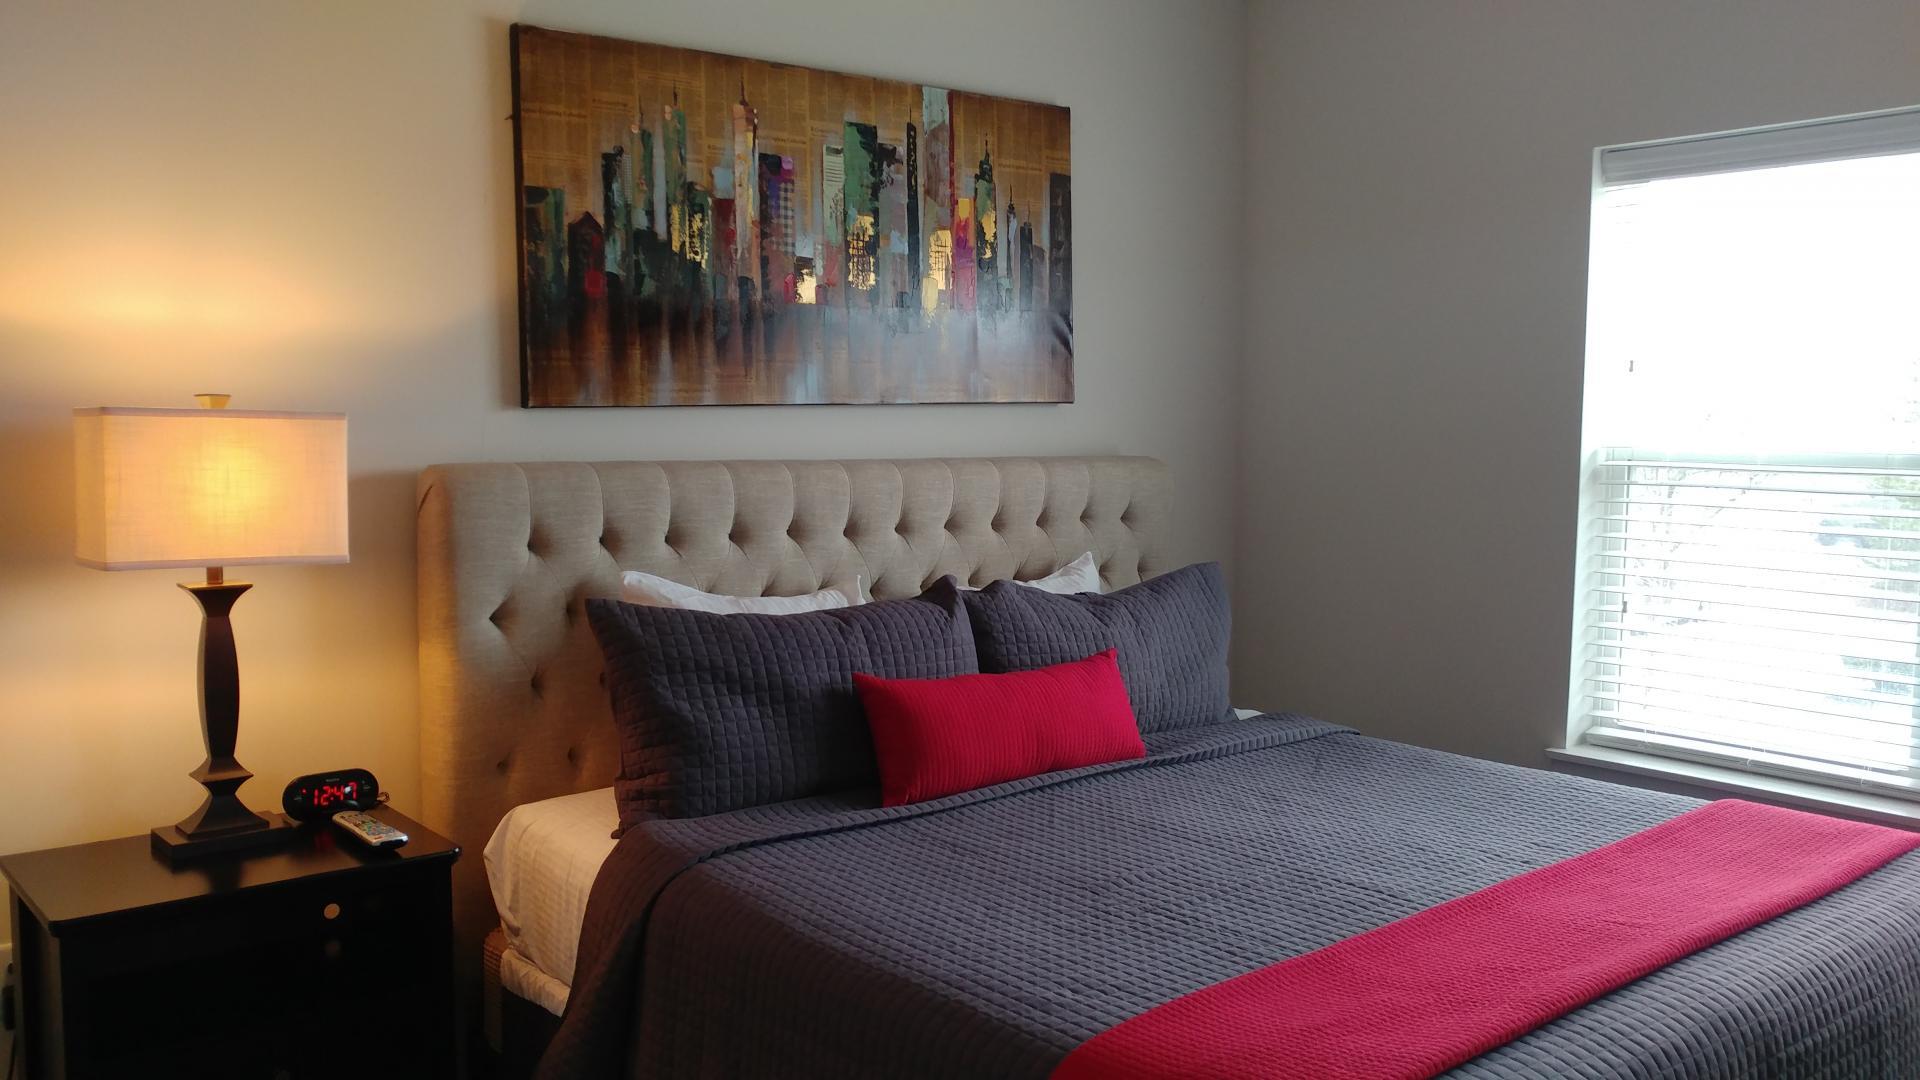 Bedroom at Vanguard Heights Apartments